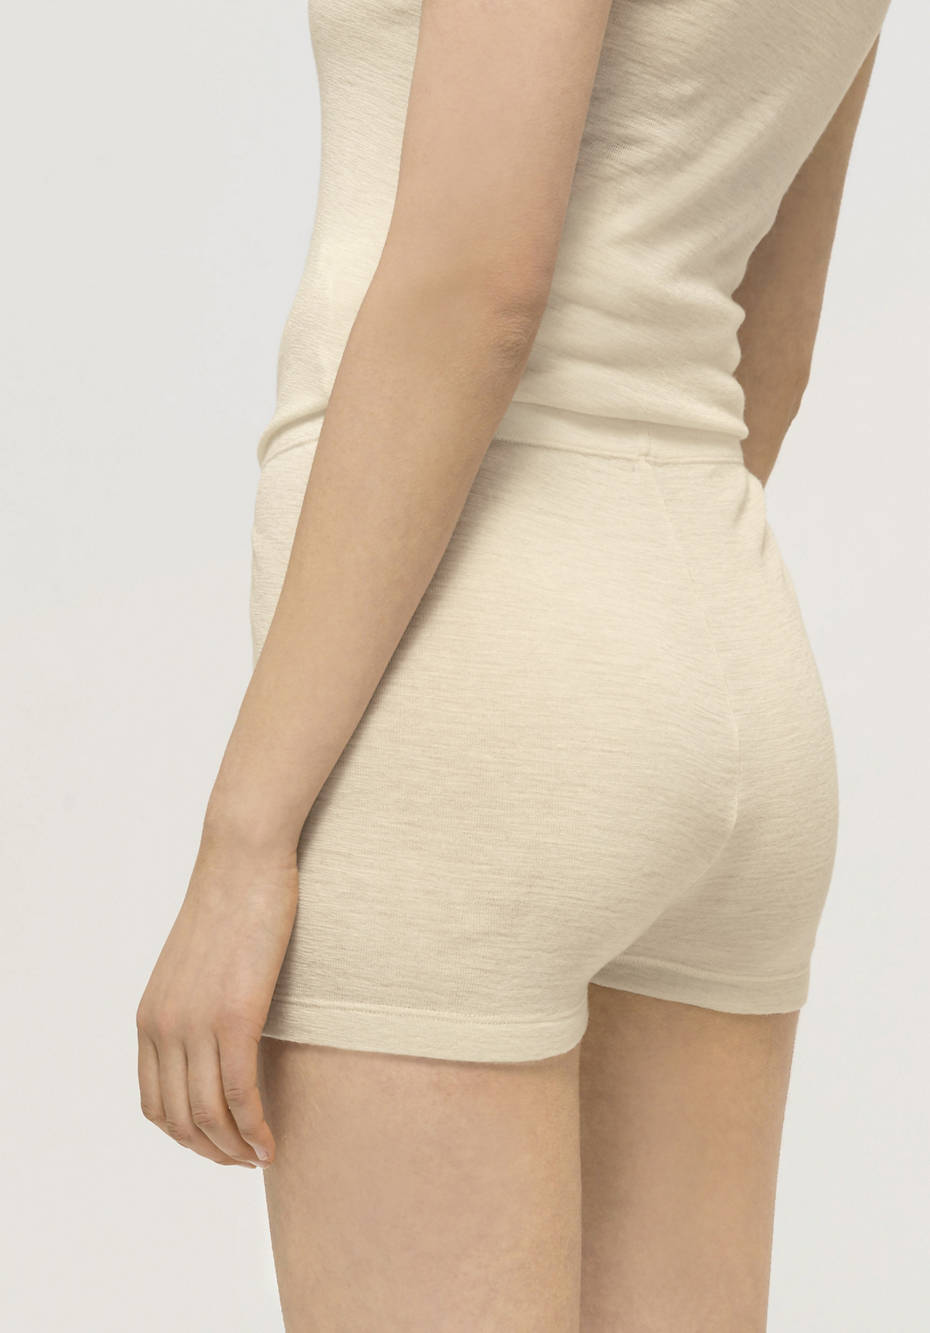 Panty made from pure organic merino wool